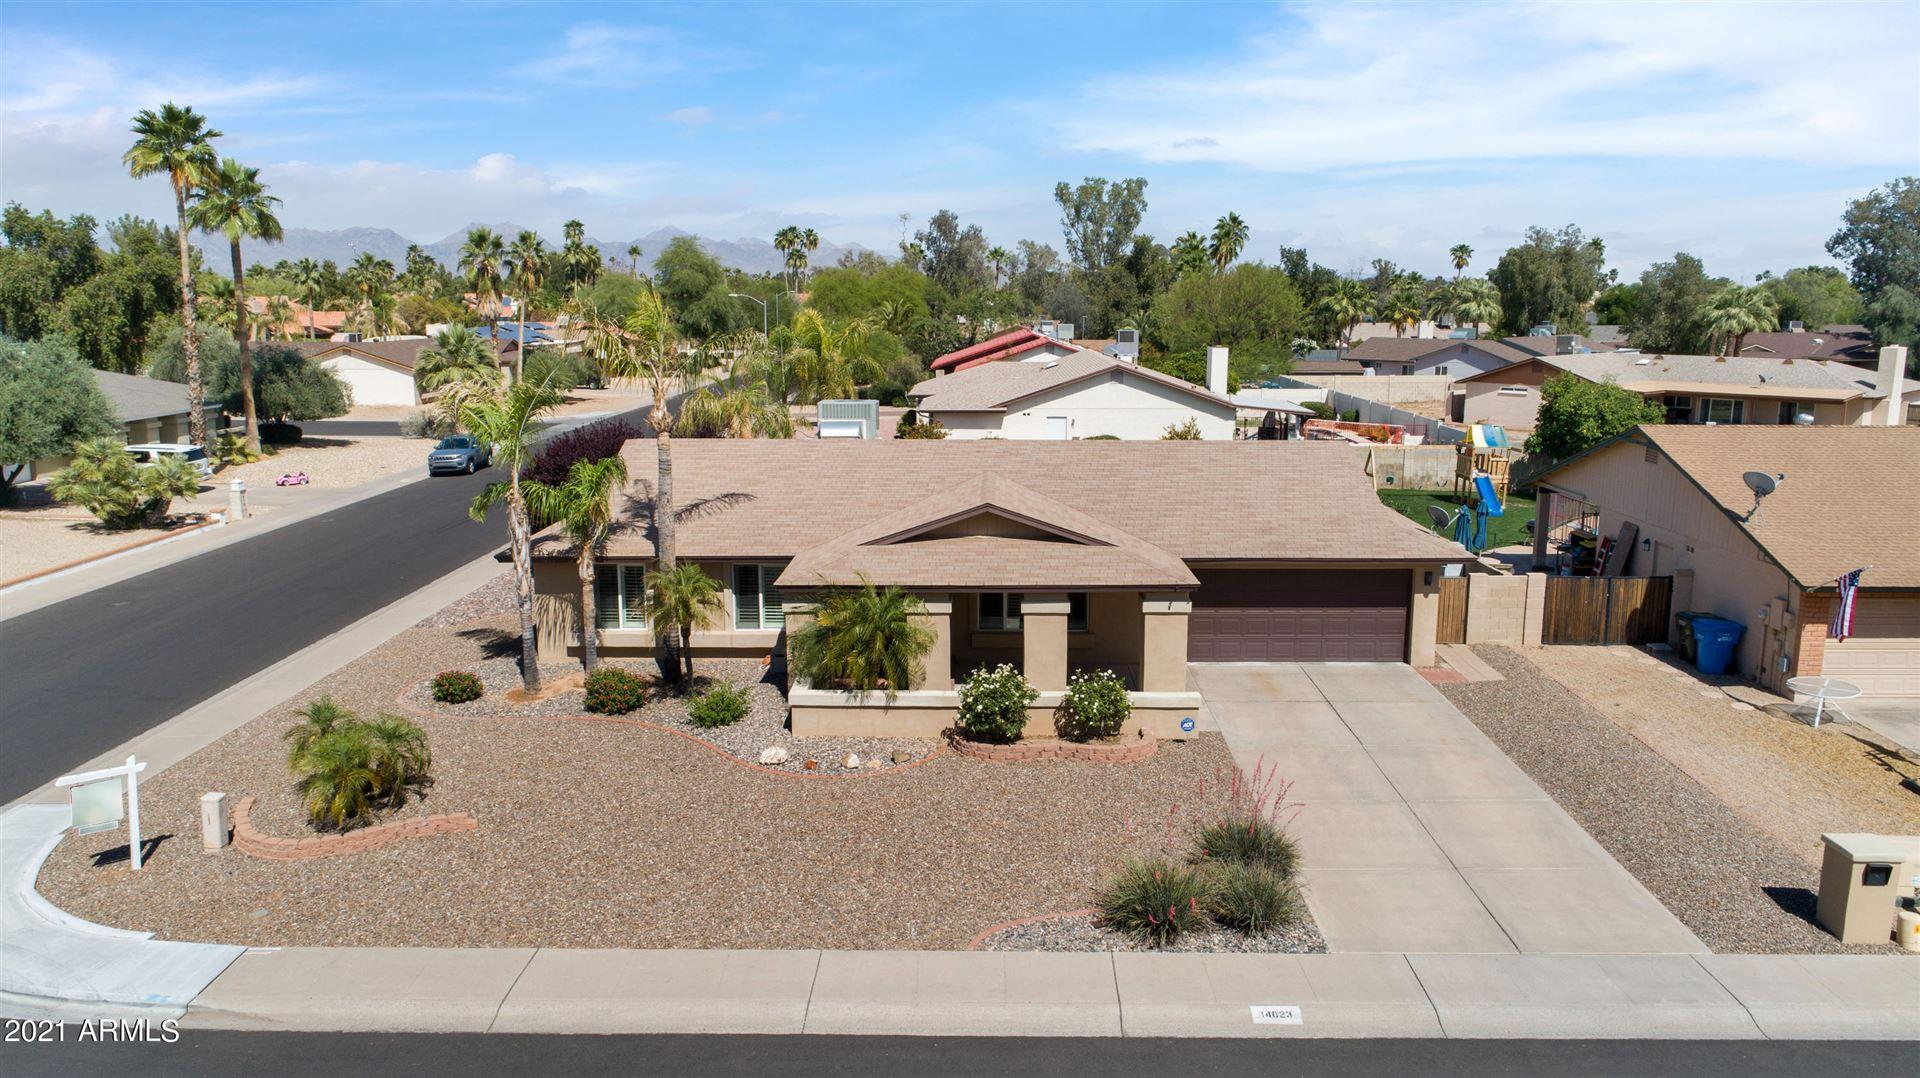 14023 N 46TH Street, Phoenix, AZ 85032 - MLS#: 6230151